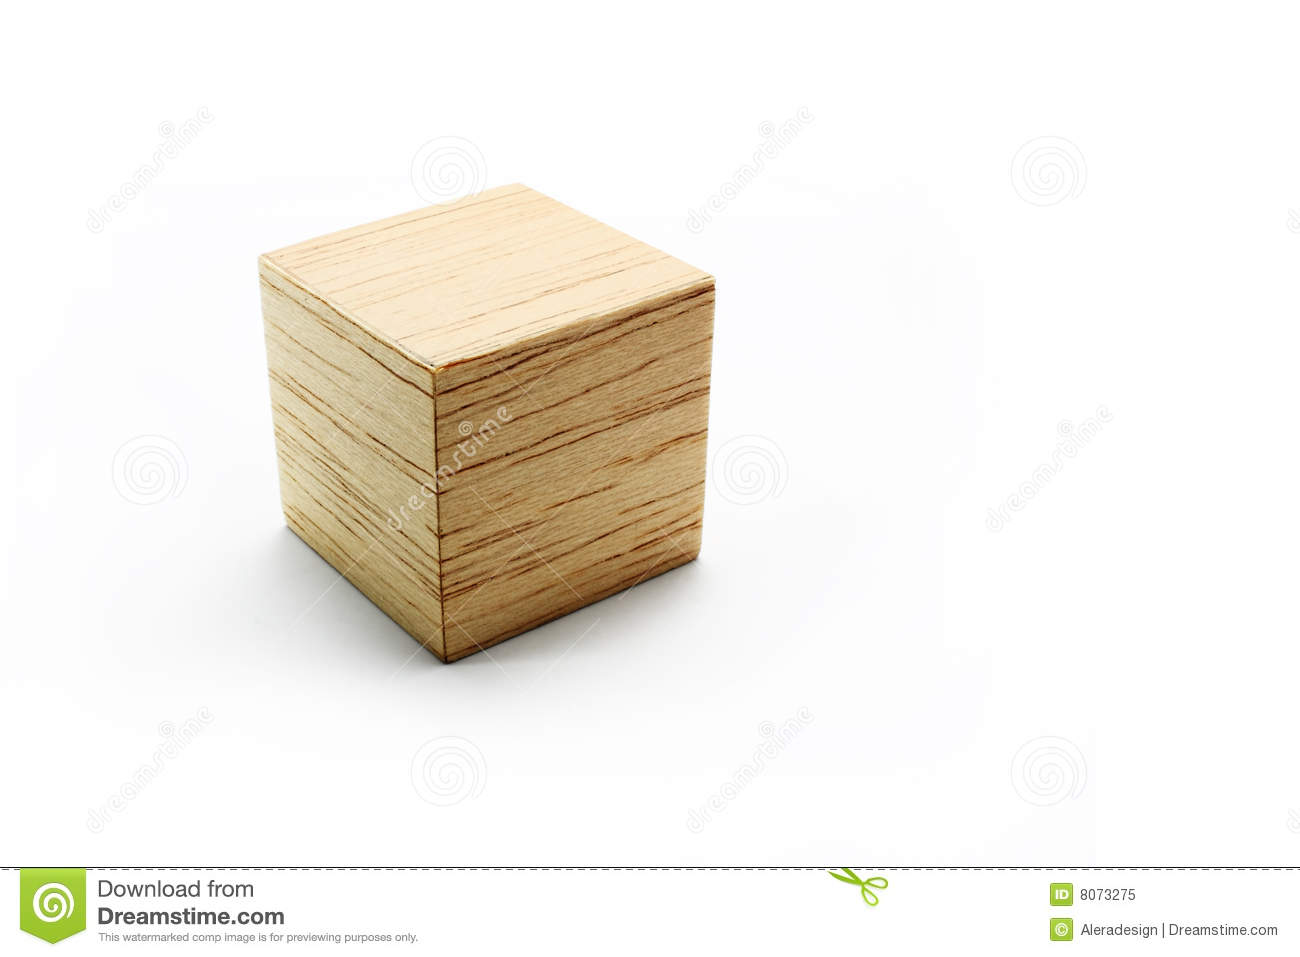 Wood clipart wood block BBCpersian7 Wood clipart 8073275 Block